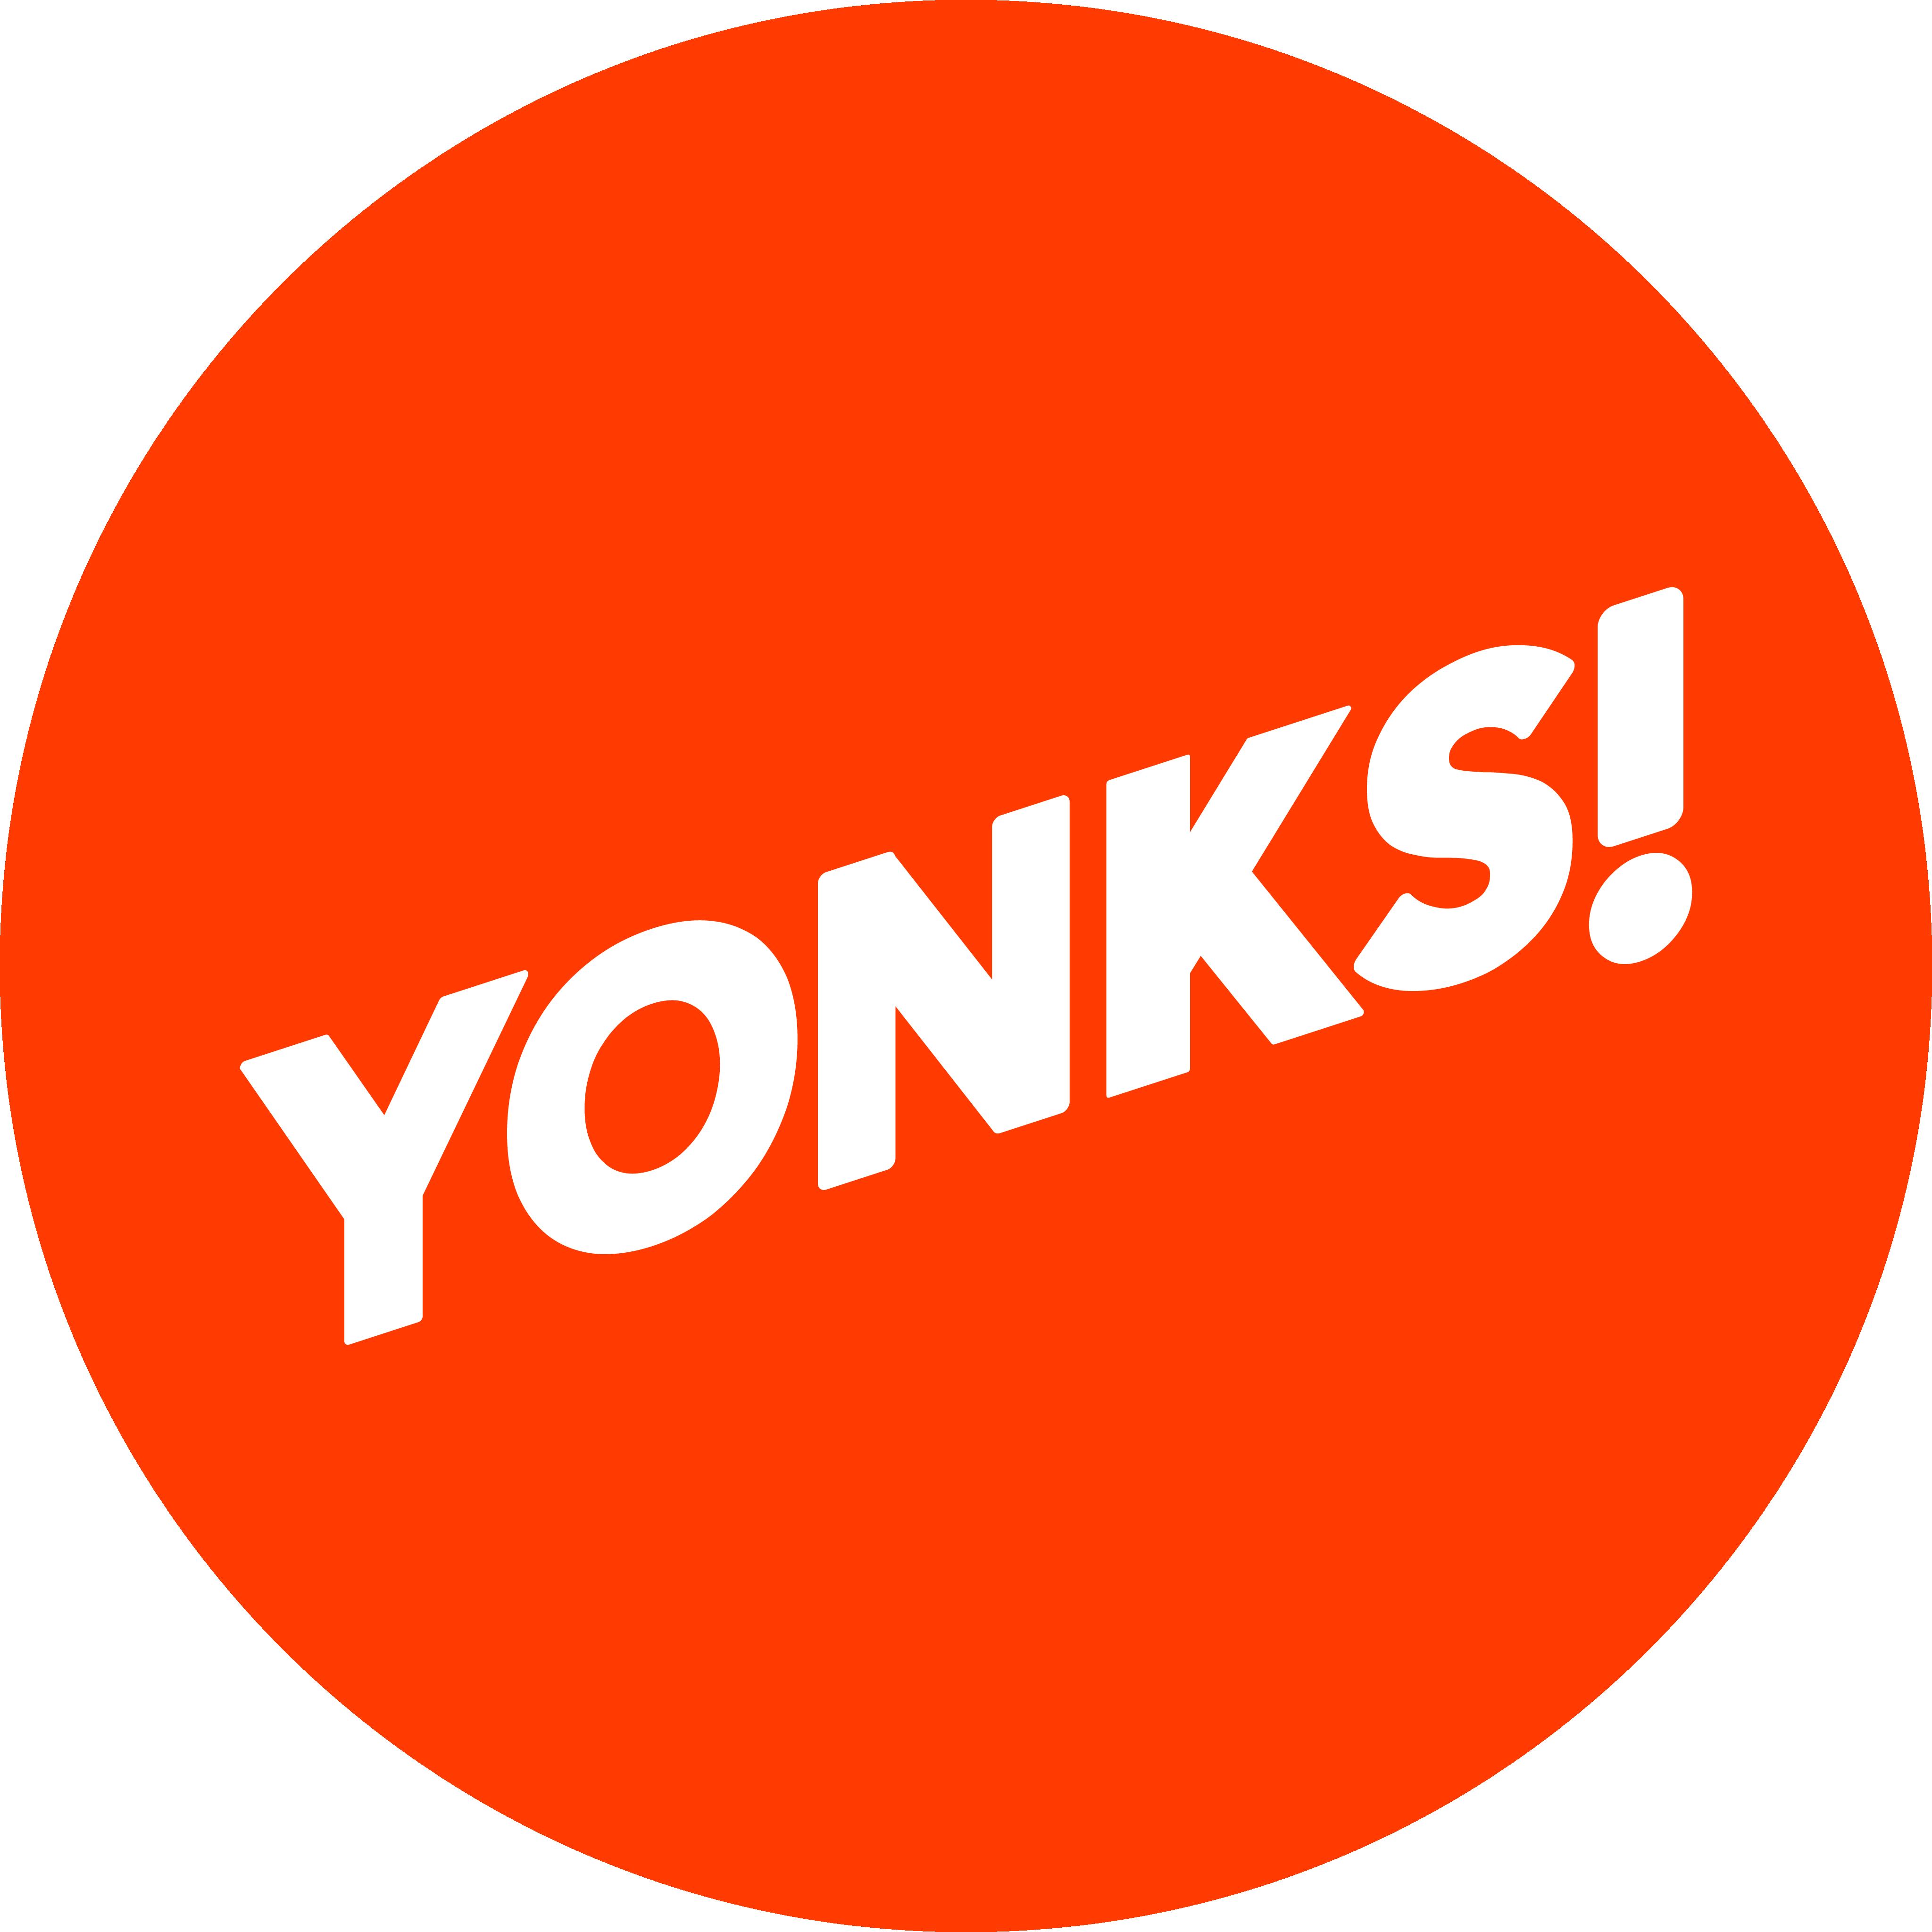 Yonks! Media